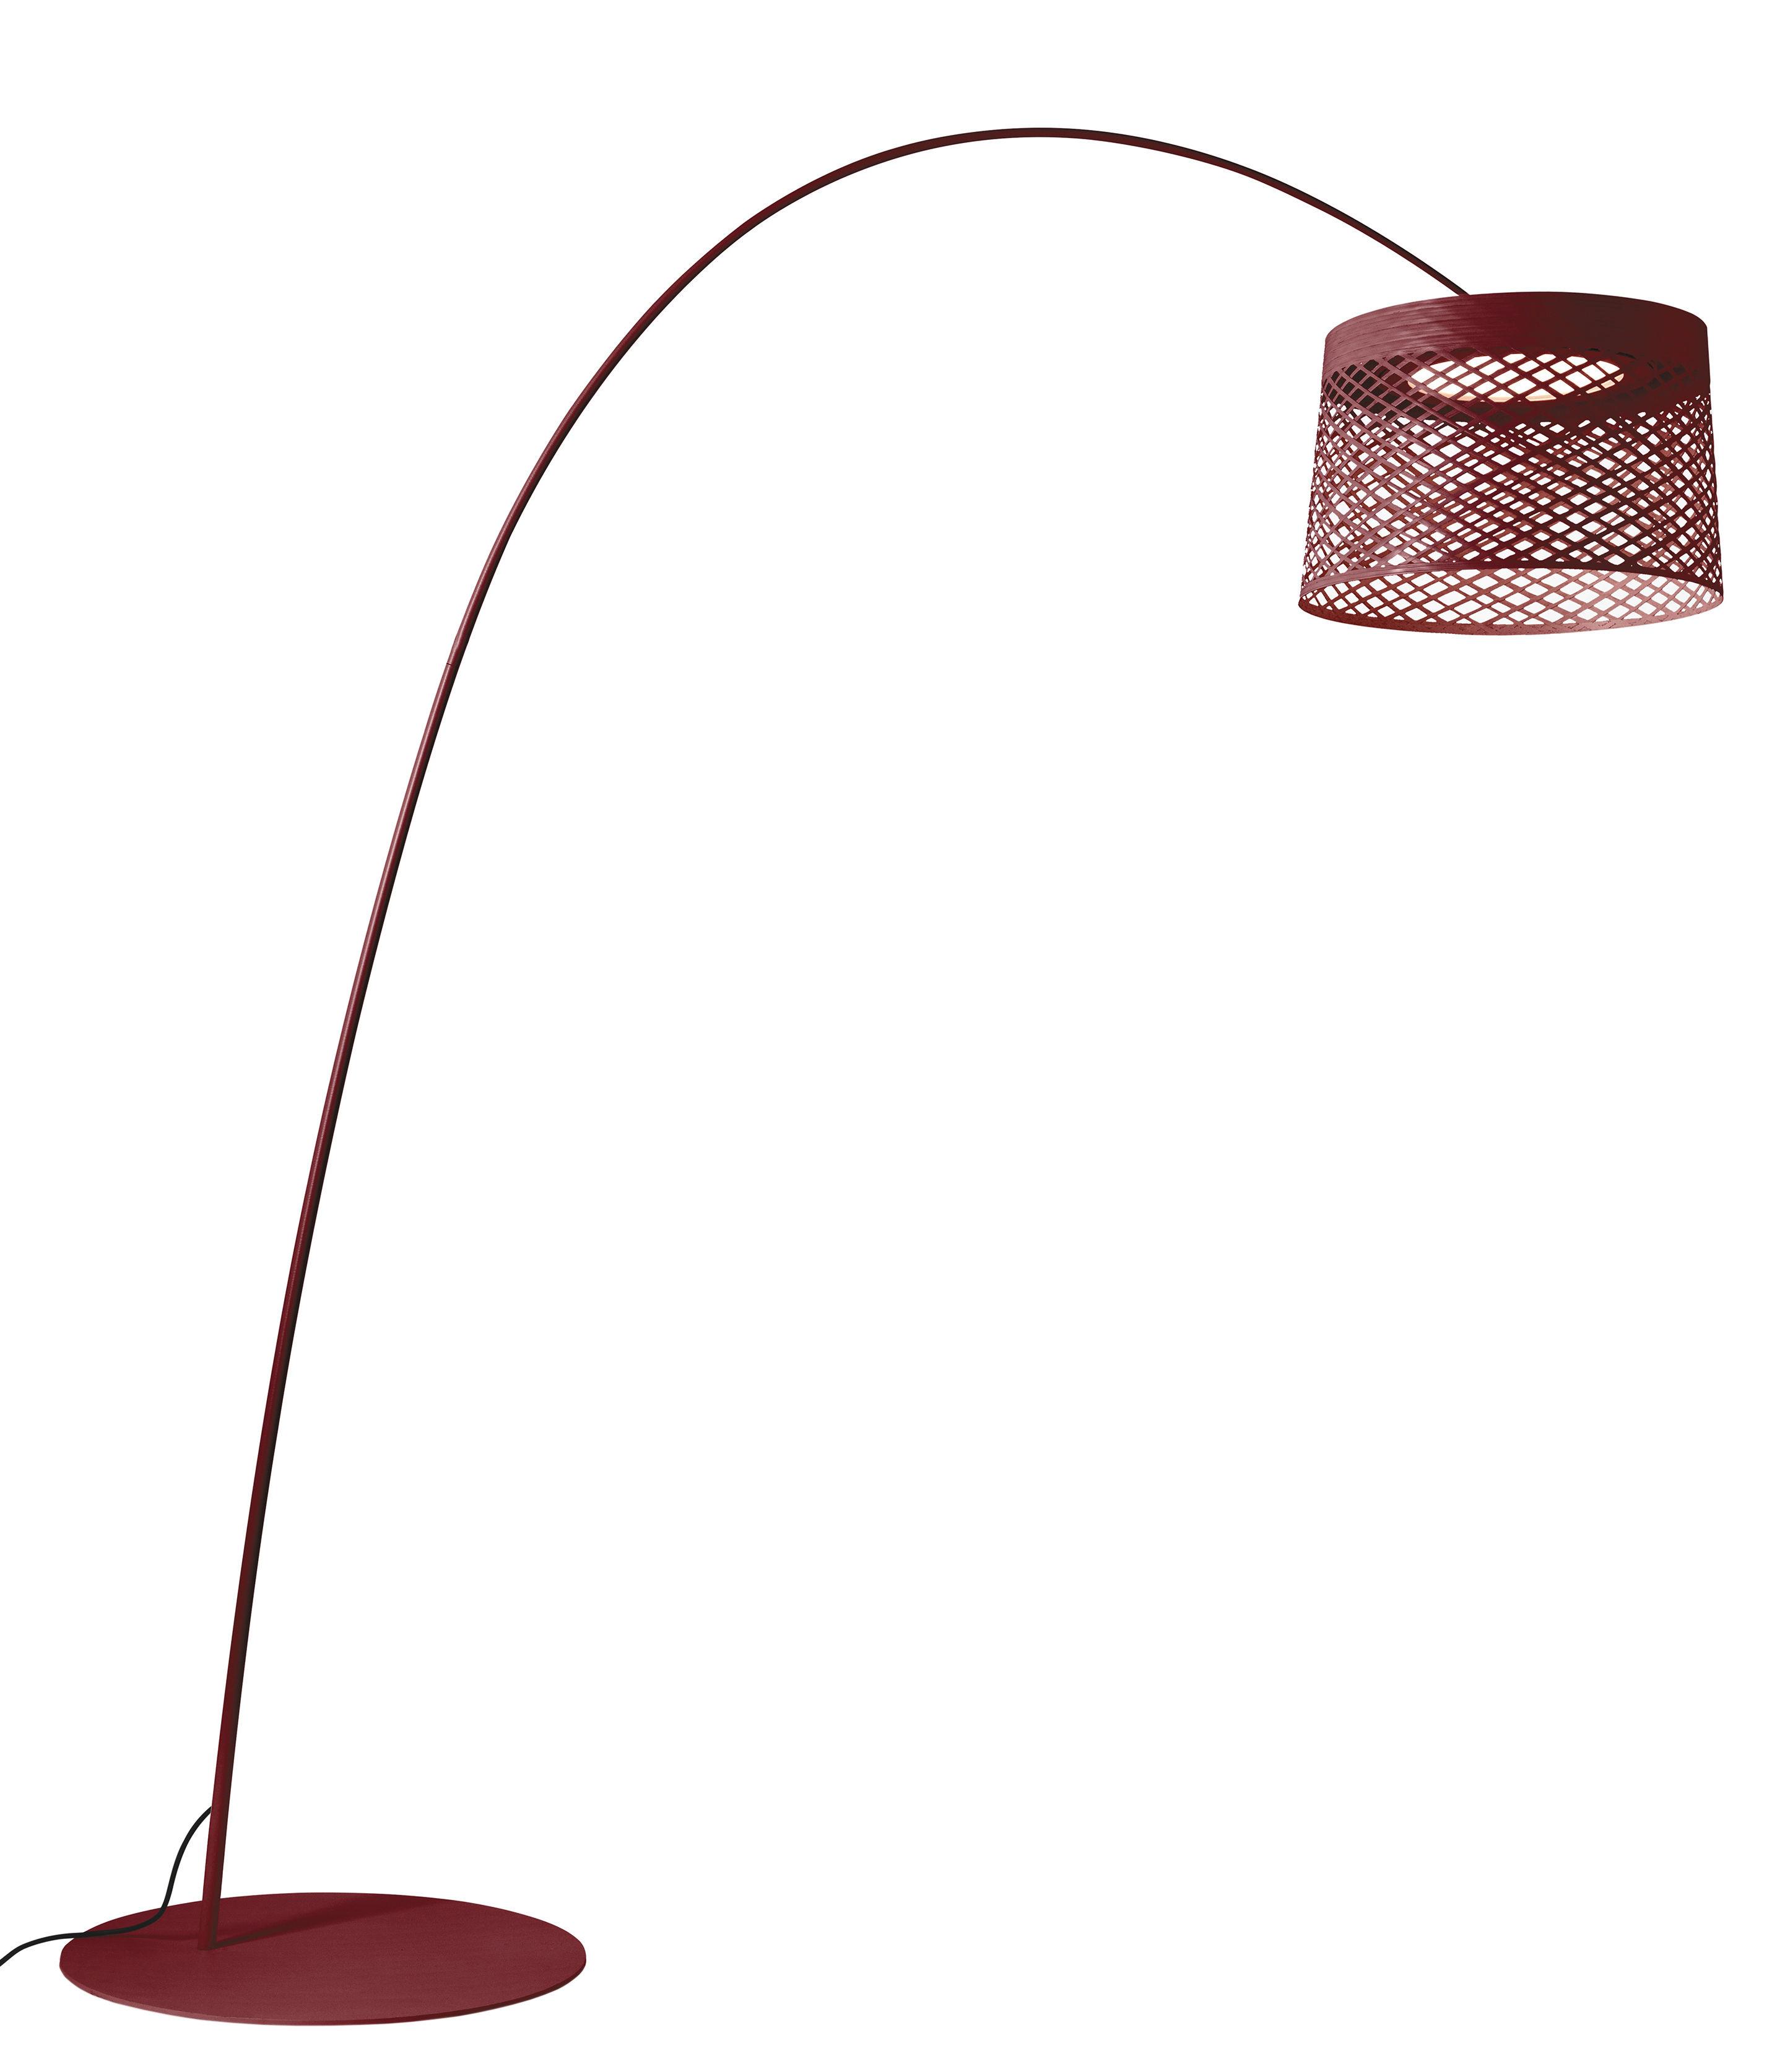 Lighting - Floor lamps - Twiggy Grid LED Outdoor Floor lamp - / Ø 46 x H 29 cm by Foscarini - Crimson - Composite material, Fibreglass, Varnished metal